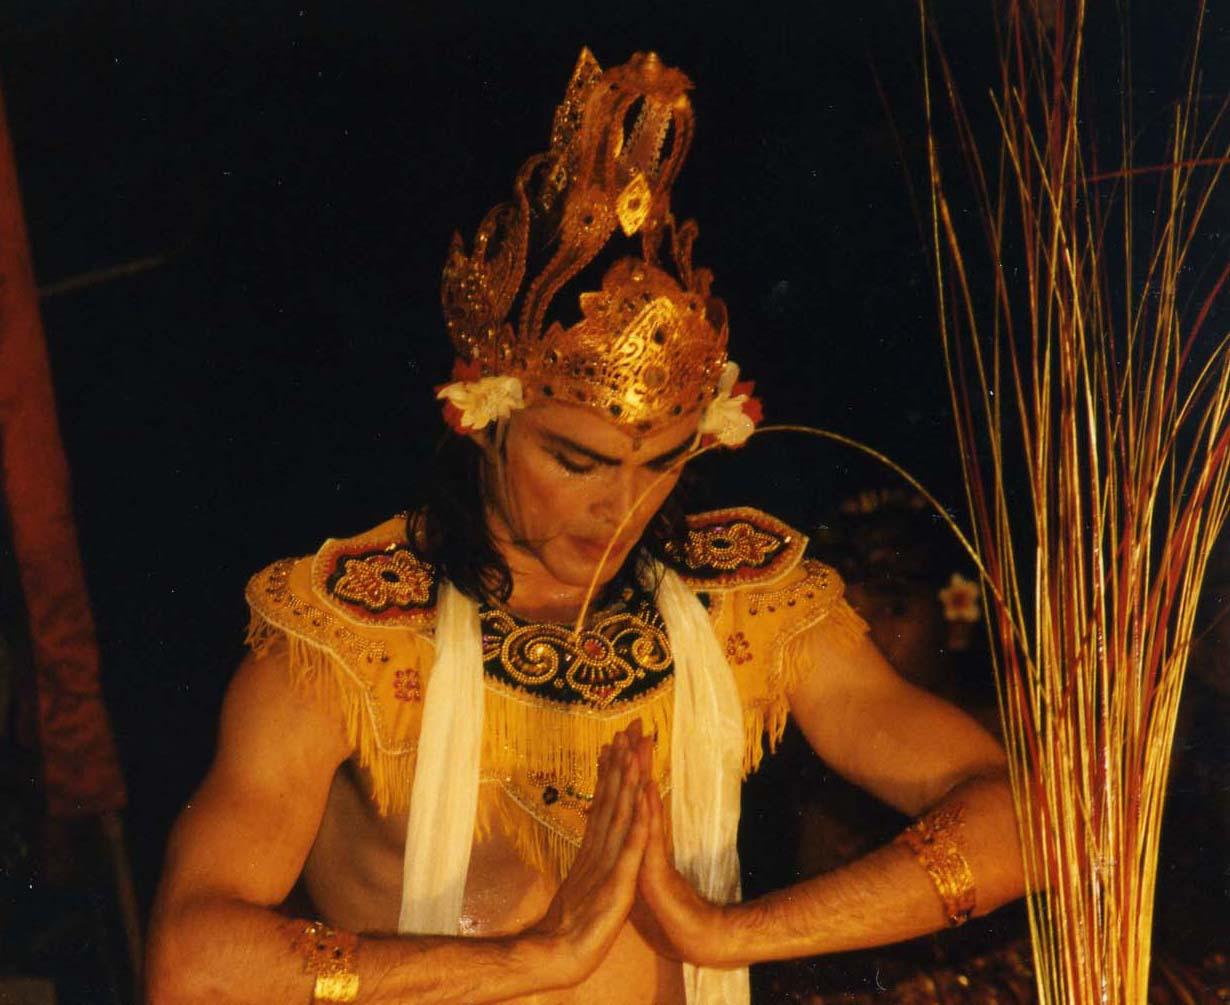 http://1.bp.blogspot.com/_HjY60hwU214/TFCXr6JfJ8I/AAAAAAAAB2E/qsy2cOXcYqQ/s1600/Bali-News-Carlos_as_Rama_in_Rama_s_Meditatin_from_Ramayana_Bali_Tour_2000.jpg